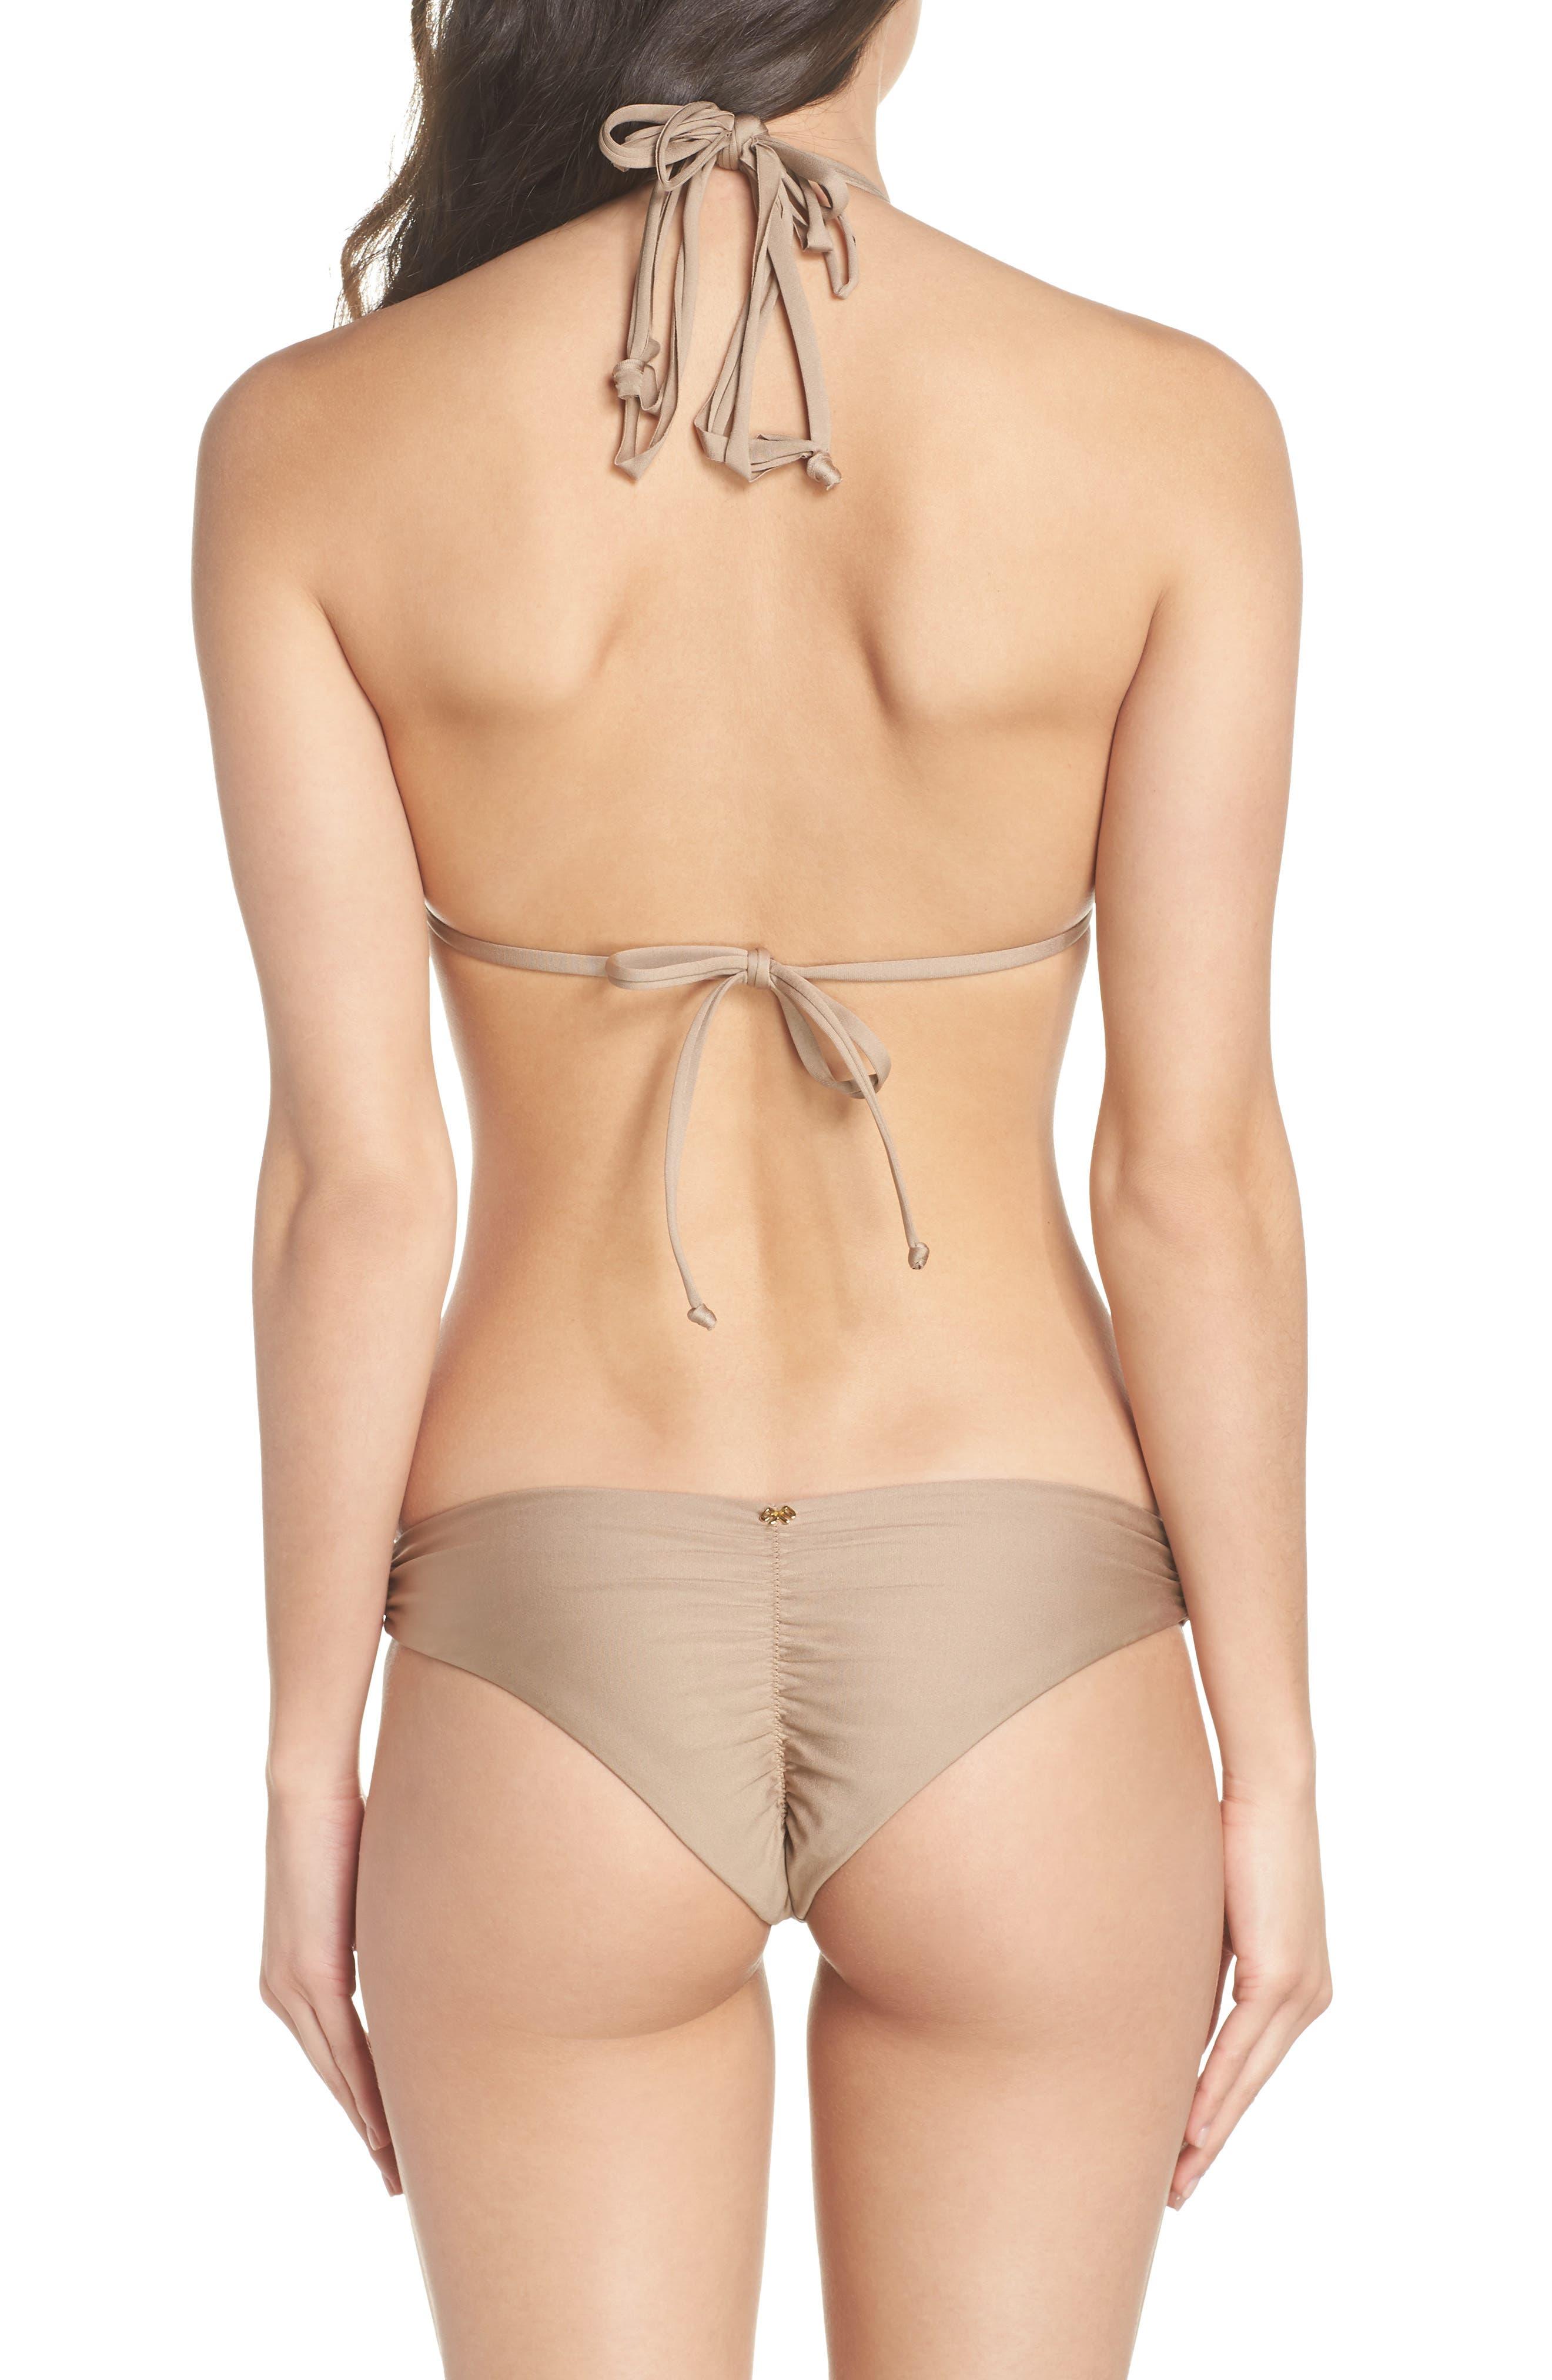 Isla Triangle Bikini Top,                             Alternate thumbnail 8, color,                             250